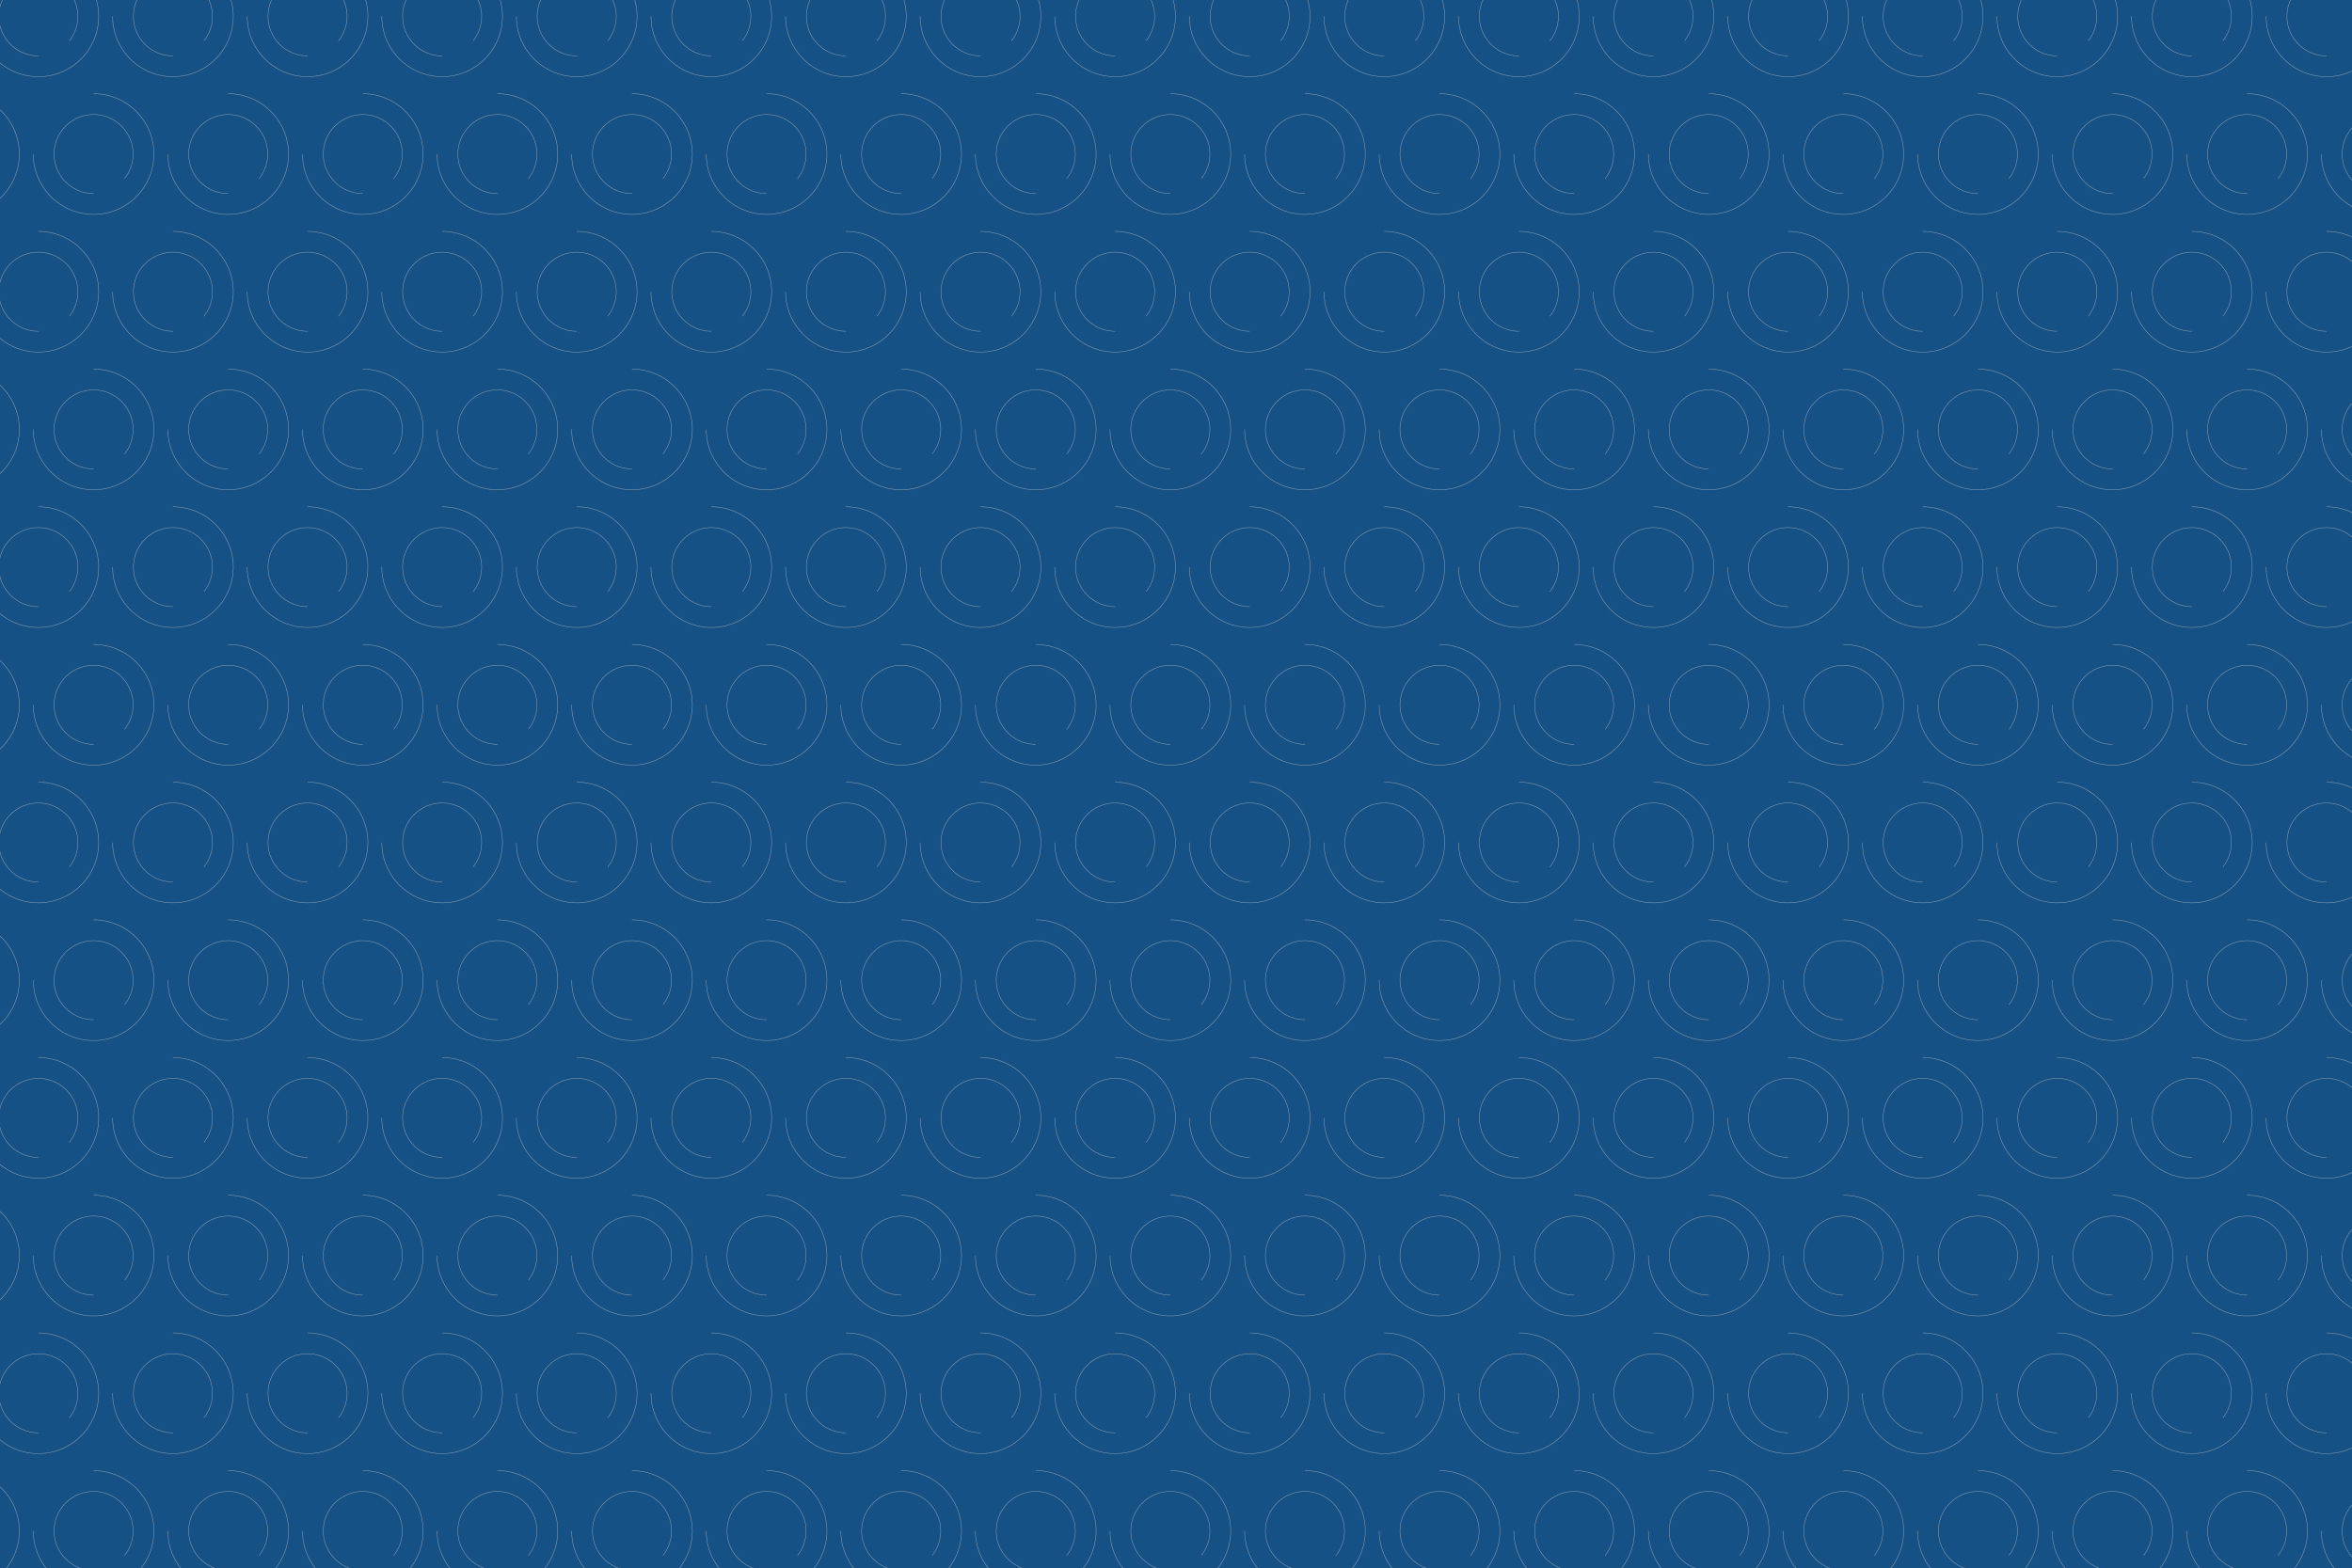 apto-web-banner-texture-circles-2-darkblue-large